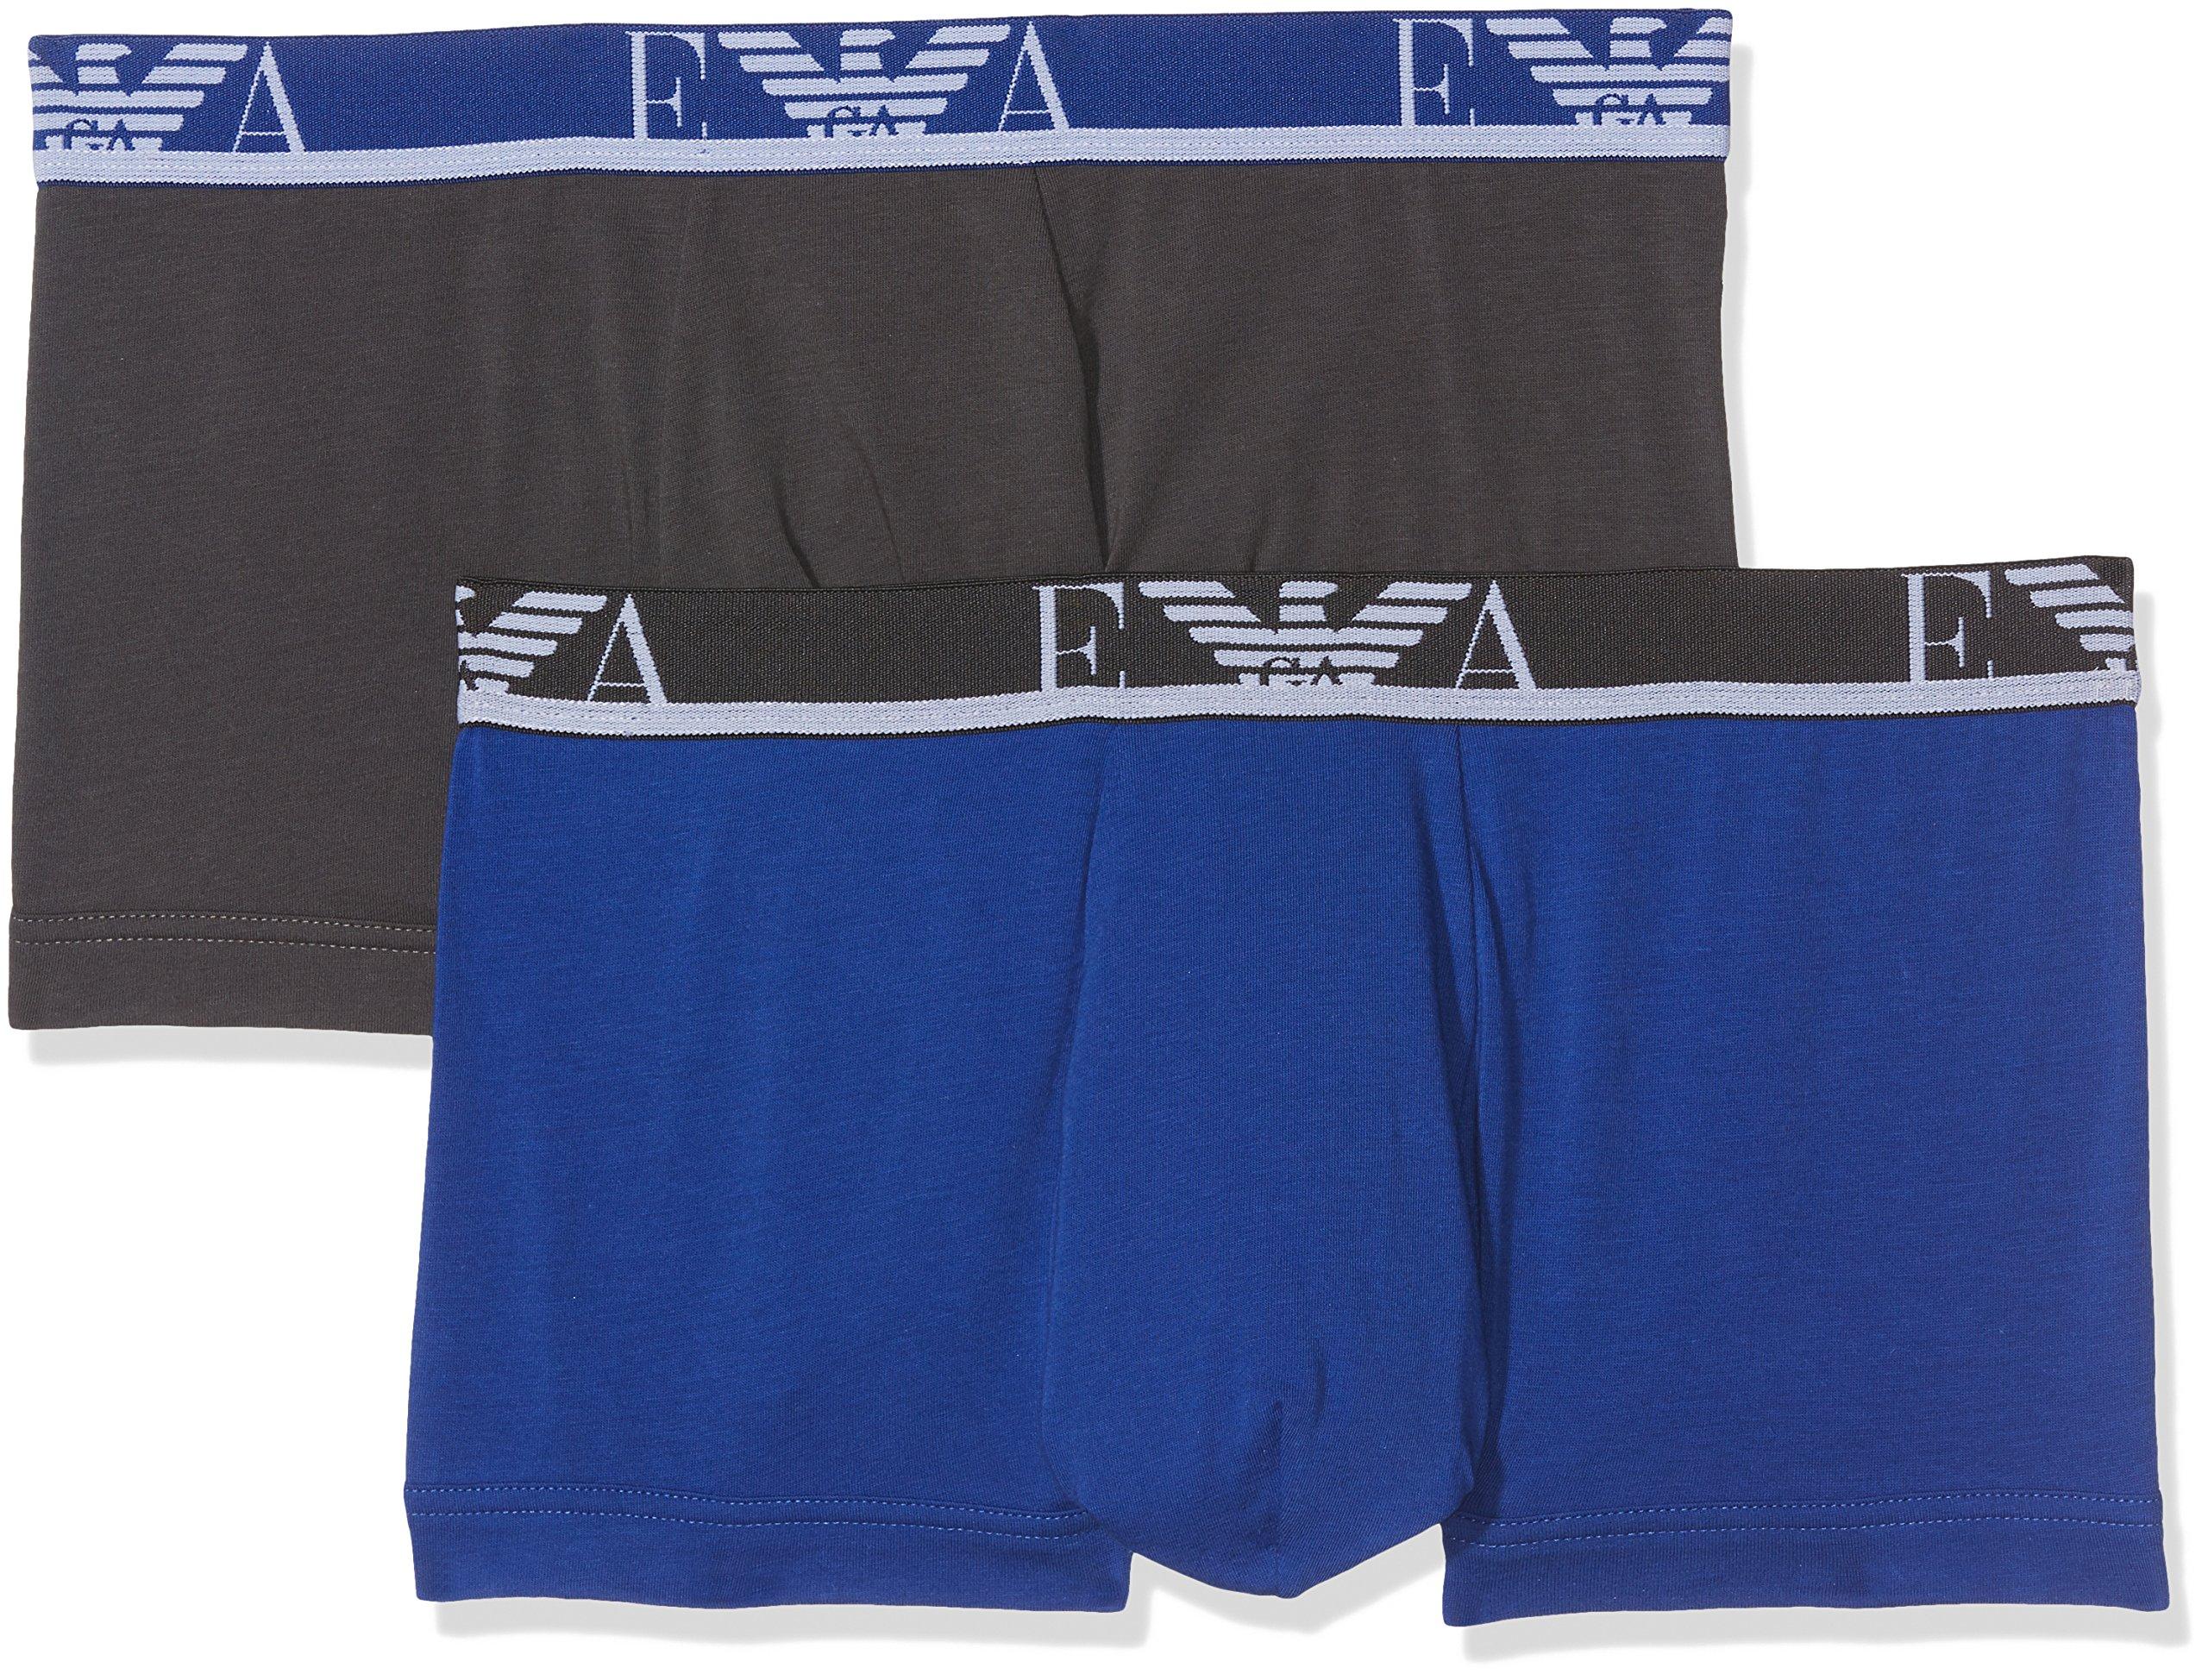 Emporio Armani Men's Monogram 2-Pack Trunk, Smoke/Electric Blue, Medium